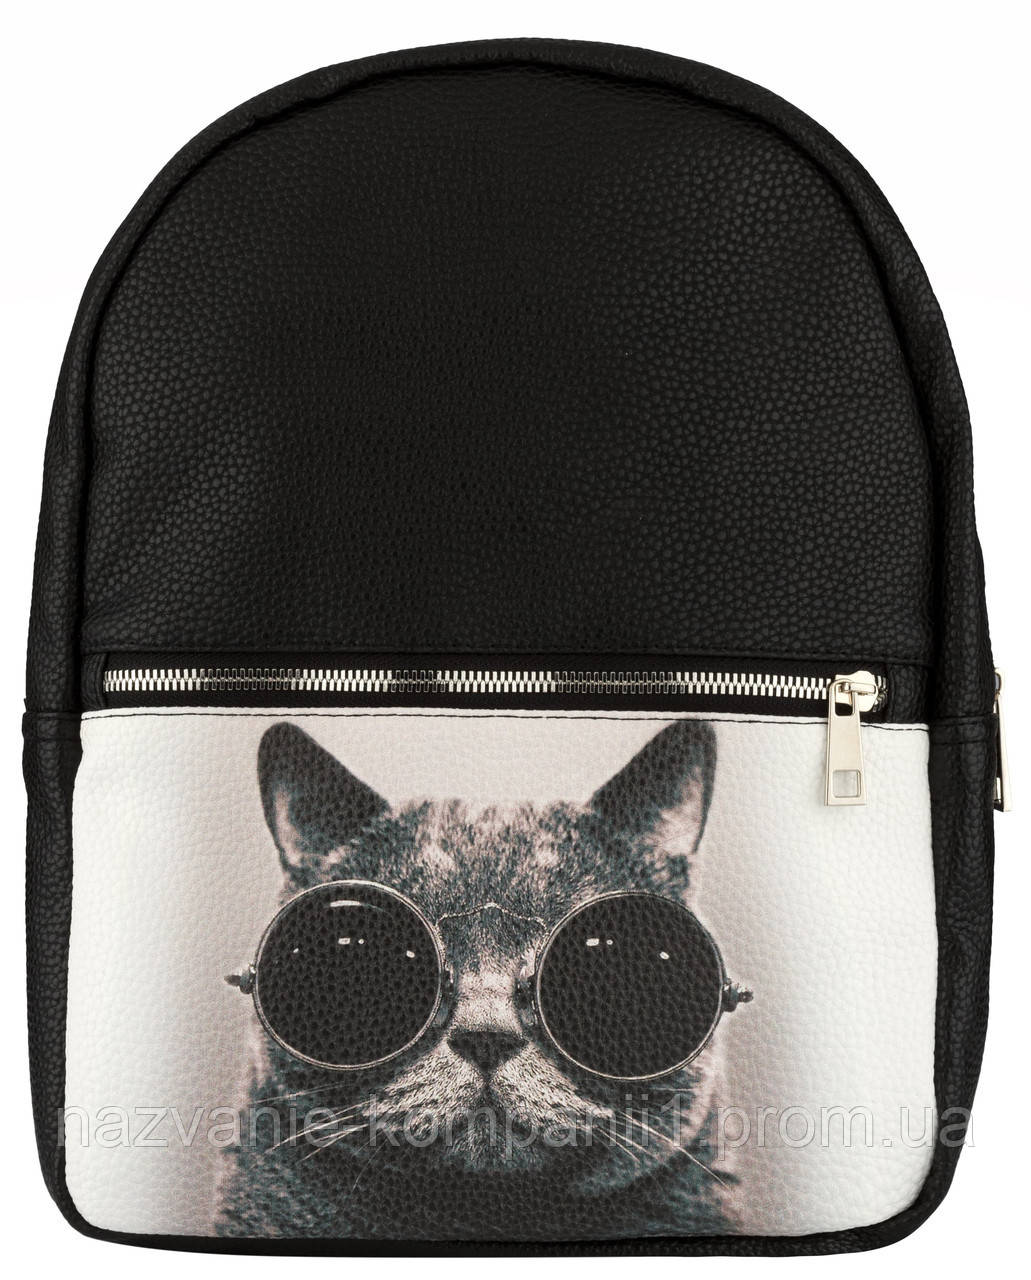 Рюкзак Coswer коты черные очки (145), цена 630 грн., интернет ... 0f9882c1a3f